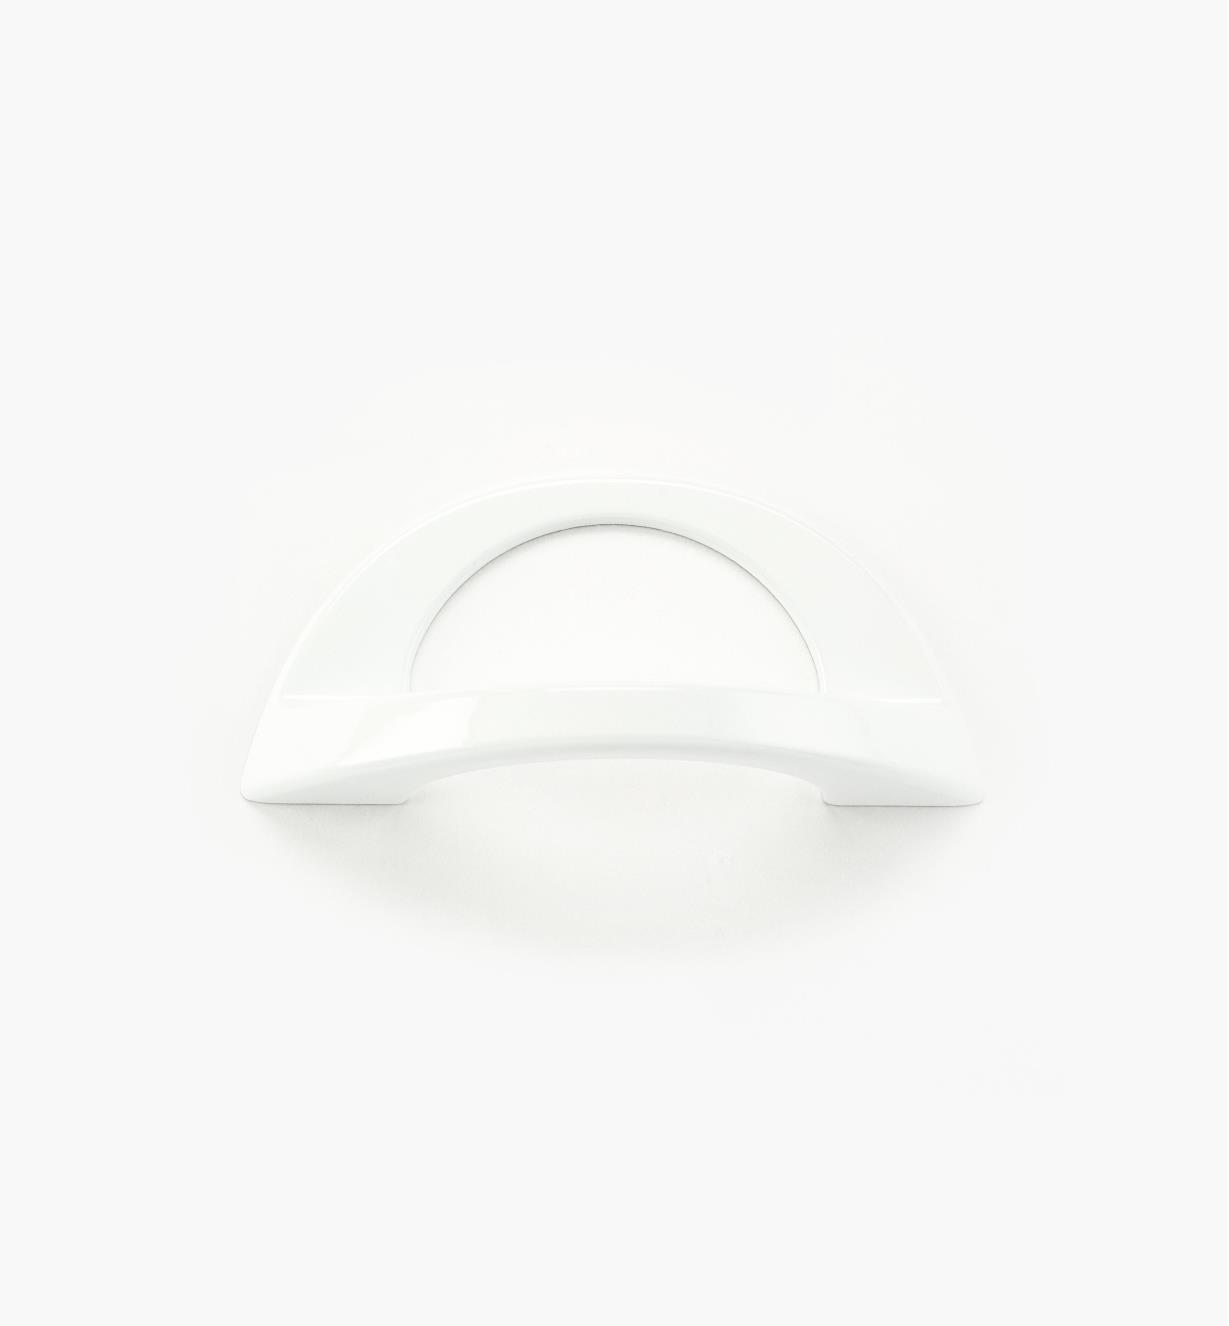 01W0861 - Poignée Polo, fini blanc, 96 mm × 40 mm